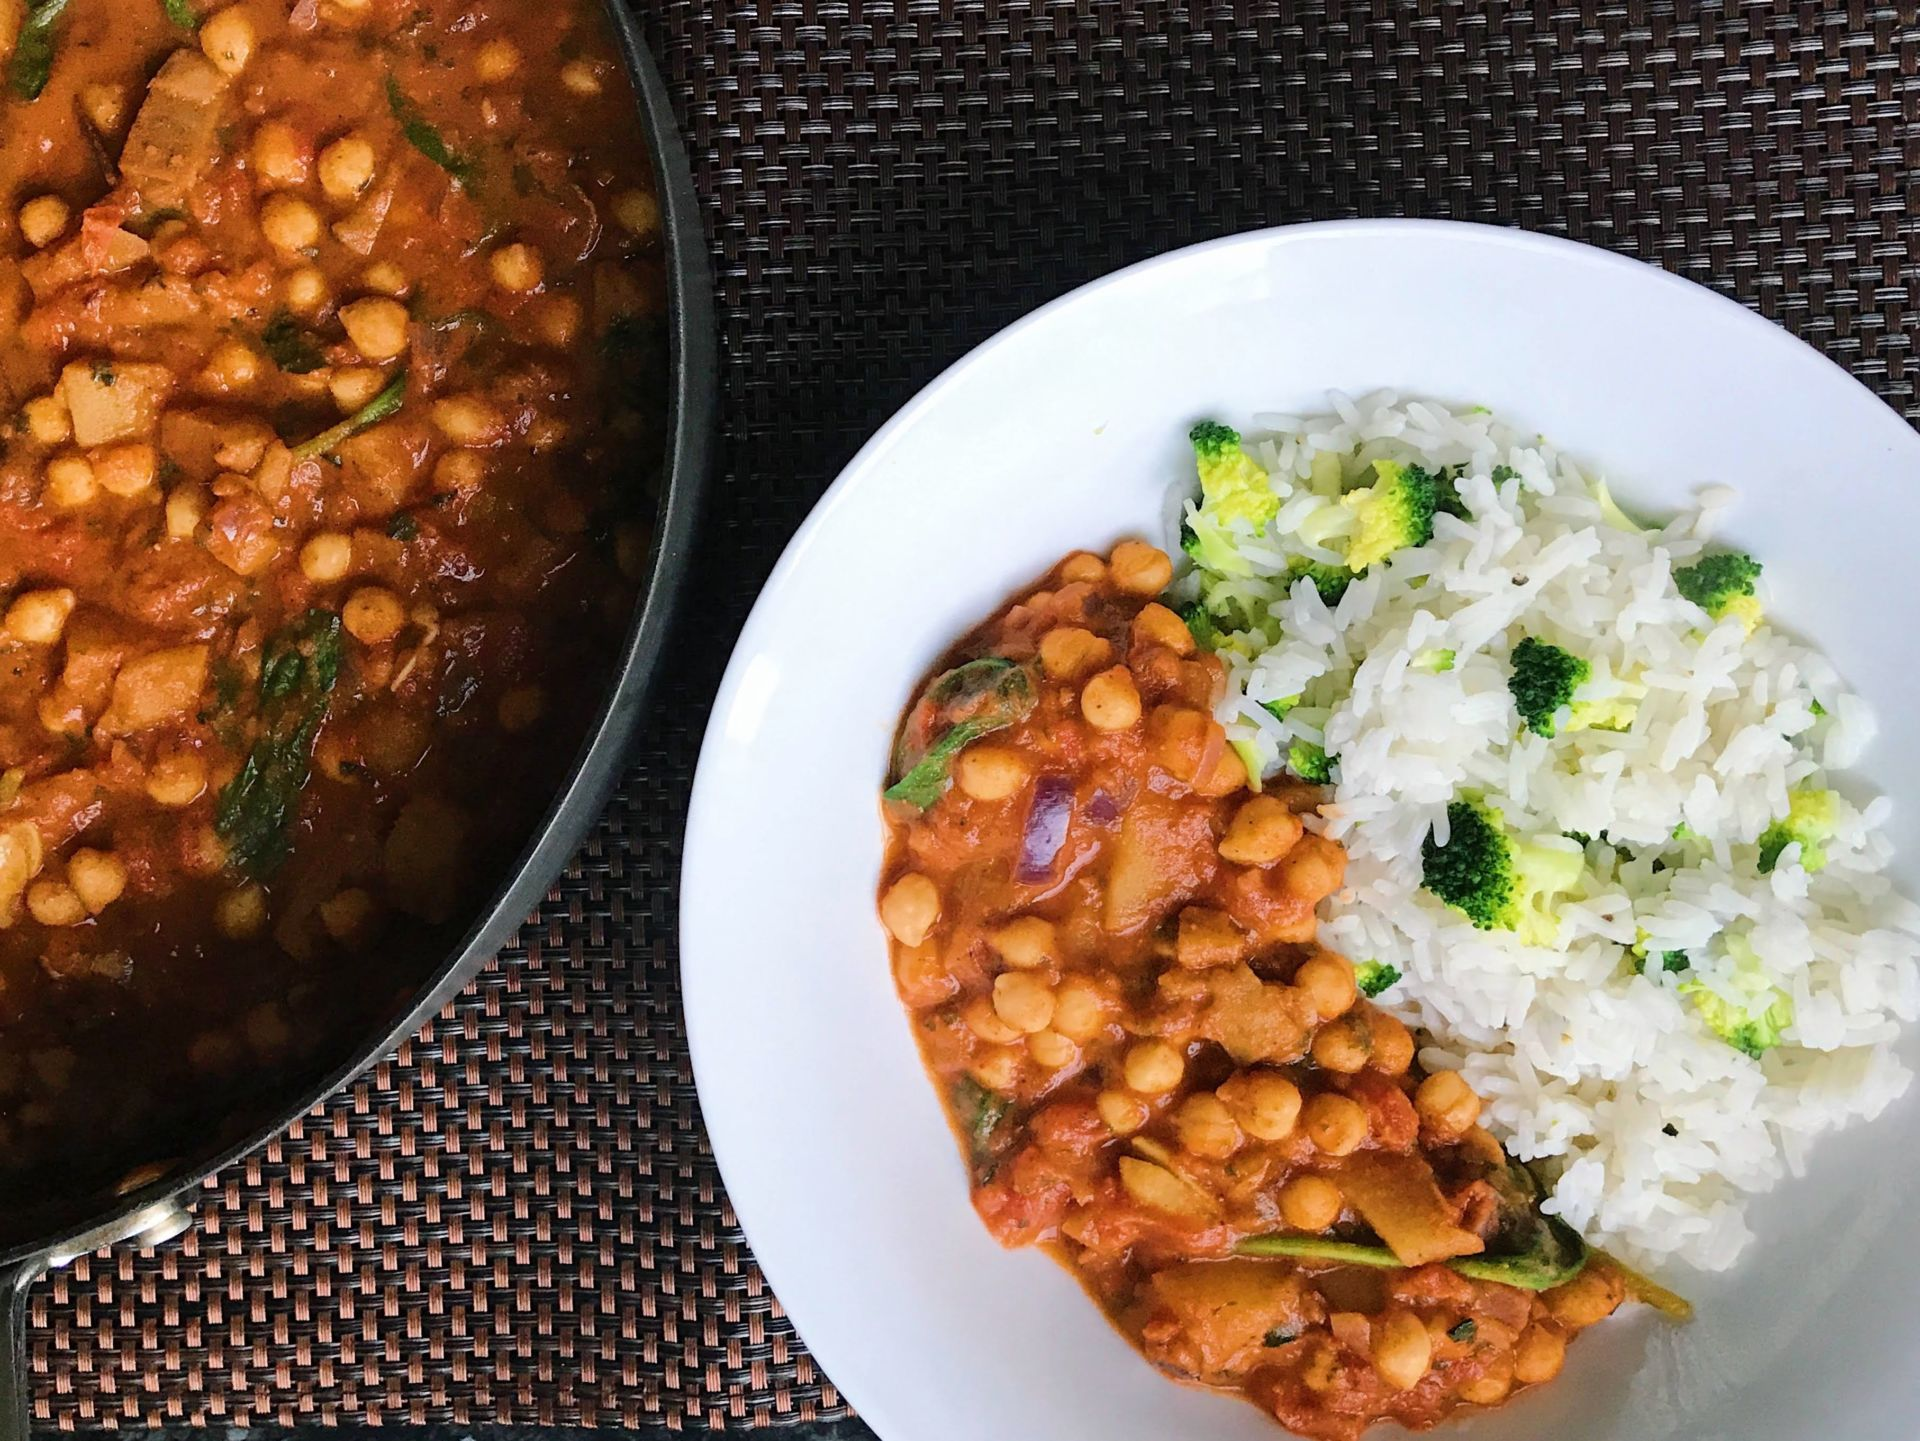 Chana Masala (Chickpea curry) and Broccoli Rice